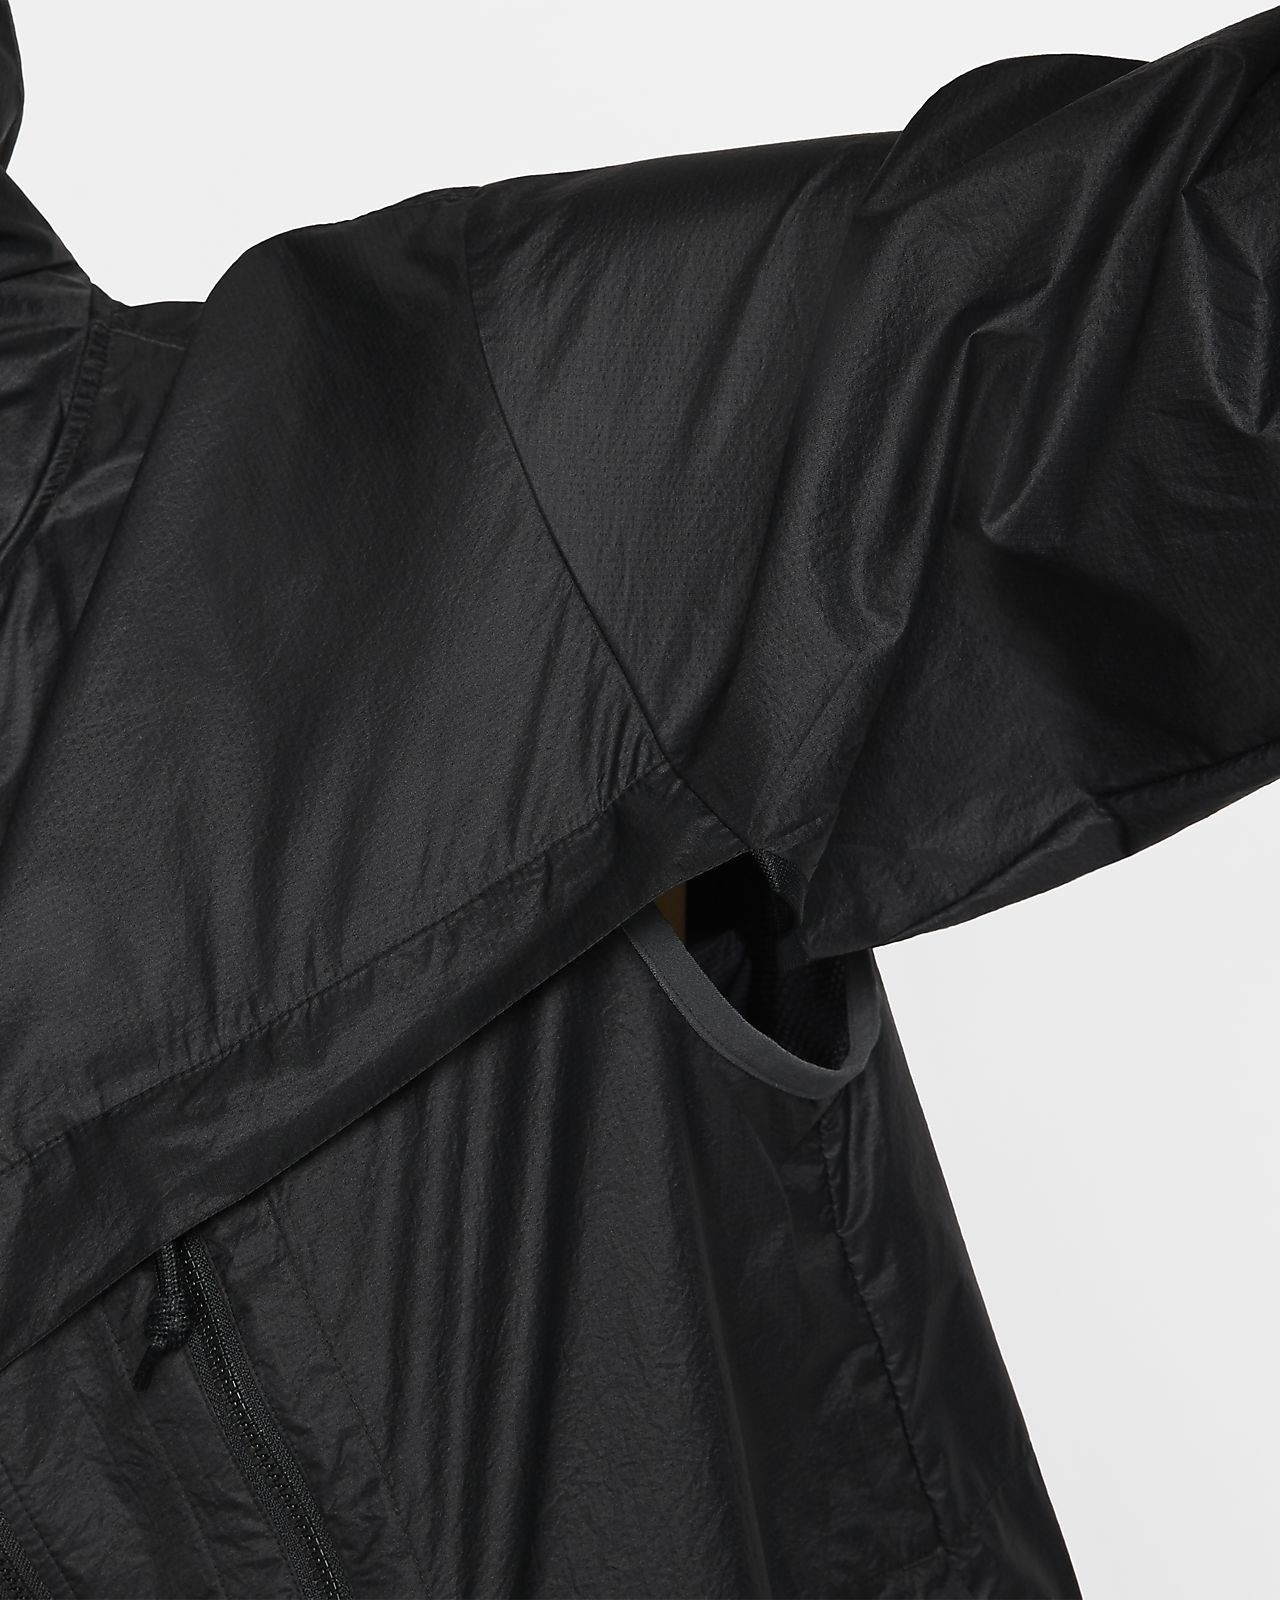 Nike ACG Damenjacke mit Kapuze